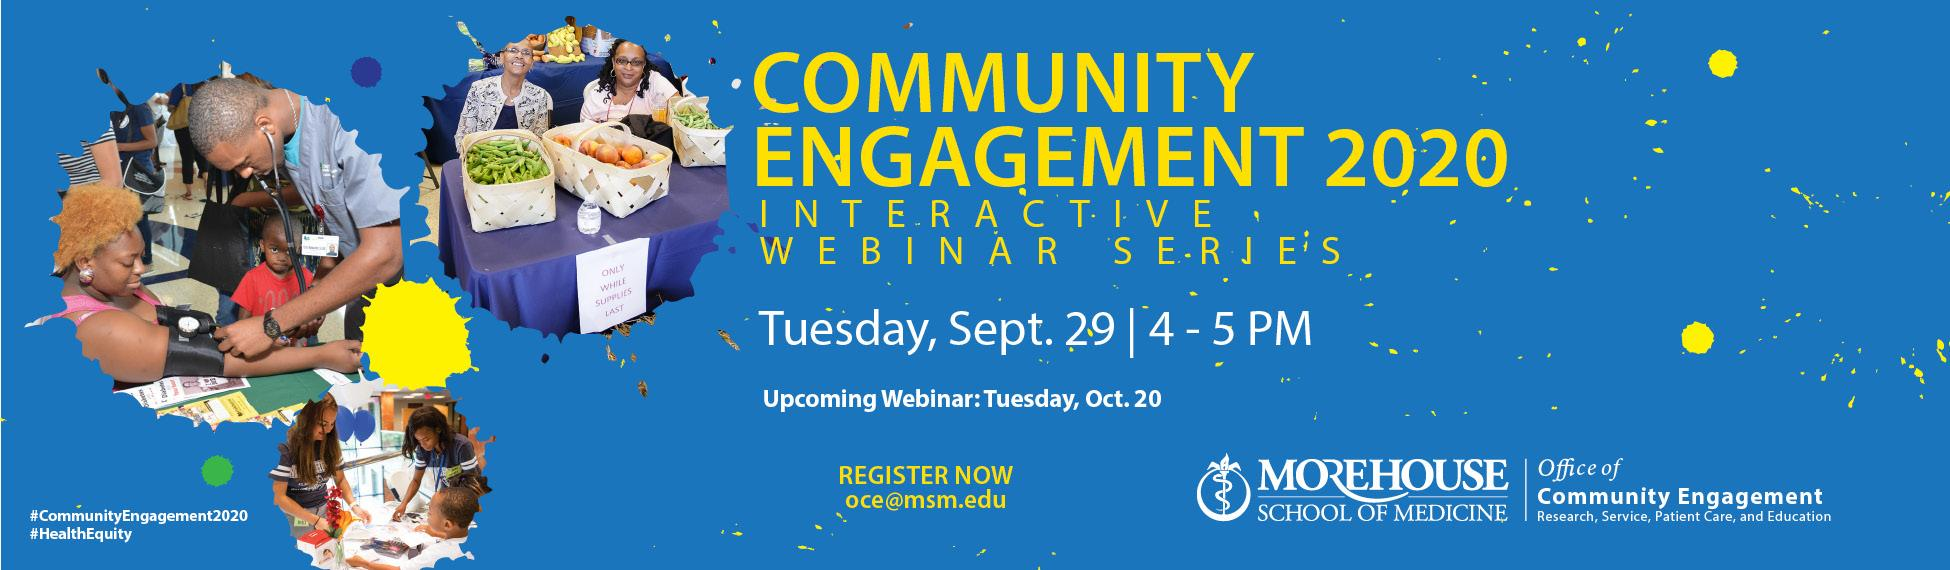 Register now for Community Engagement 2020